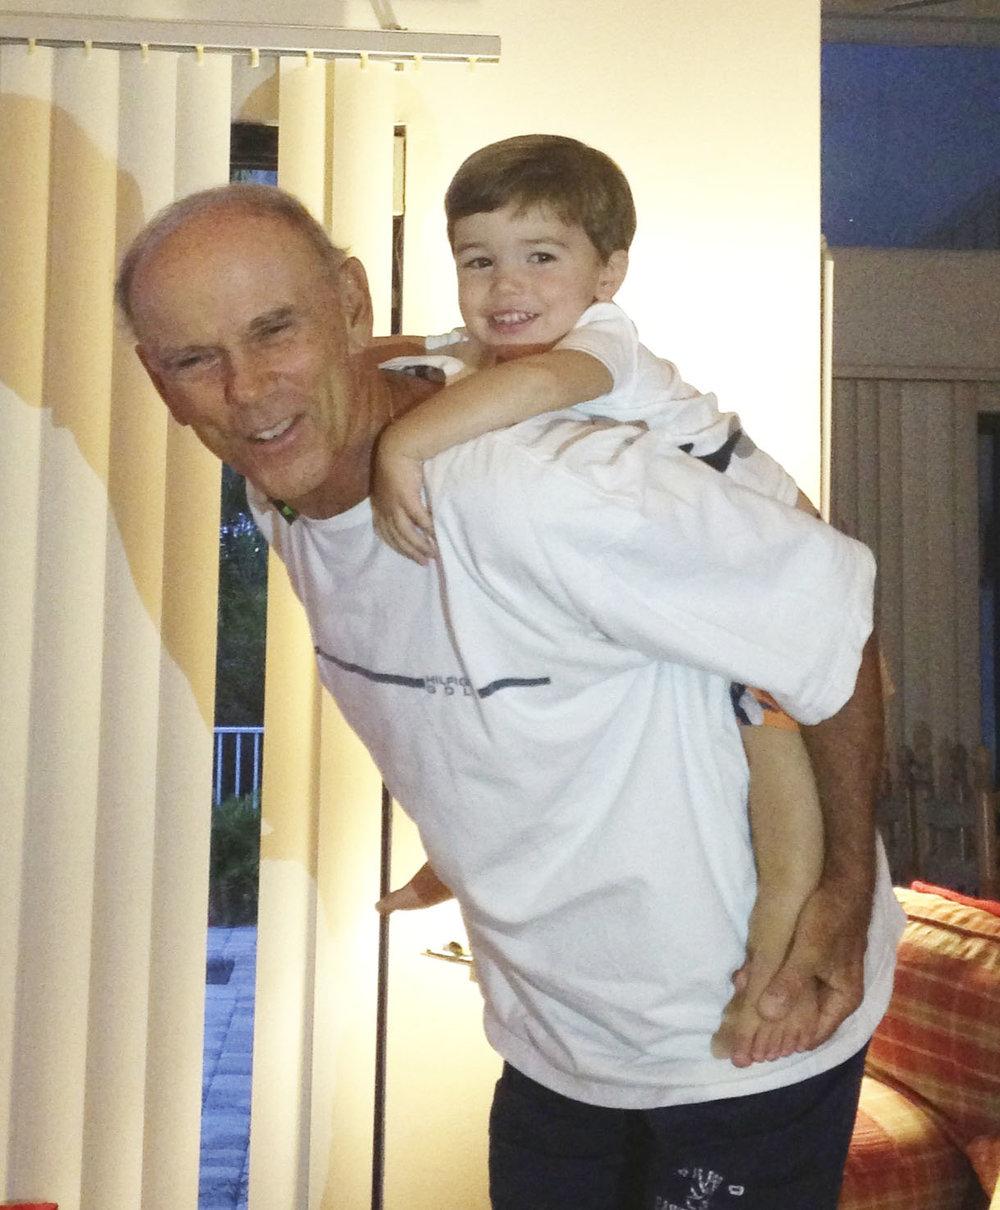 Rick-Smoliak-with-his-grandson-2006.jpg